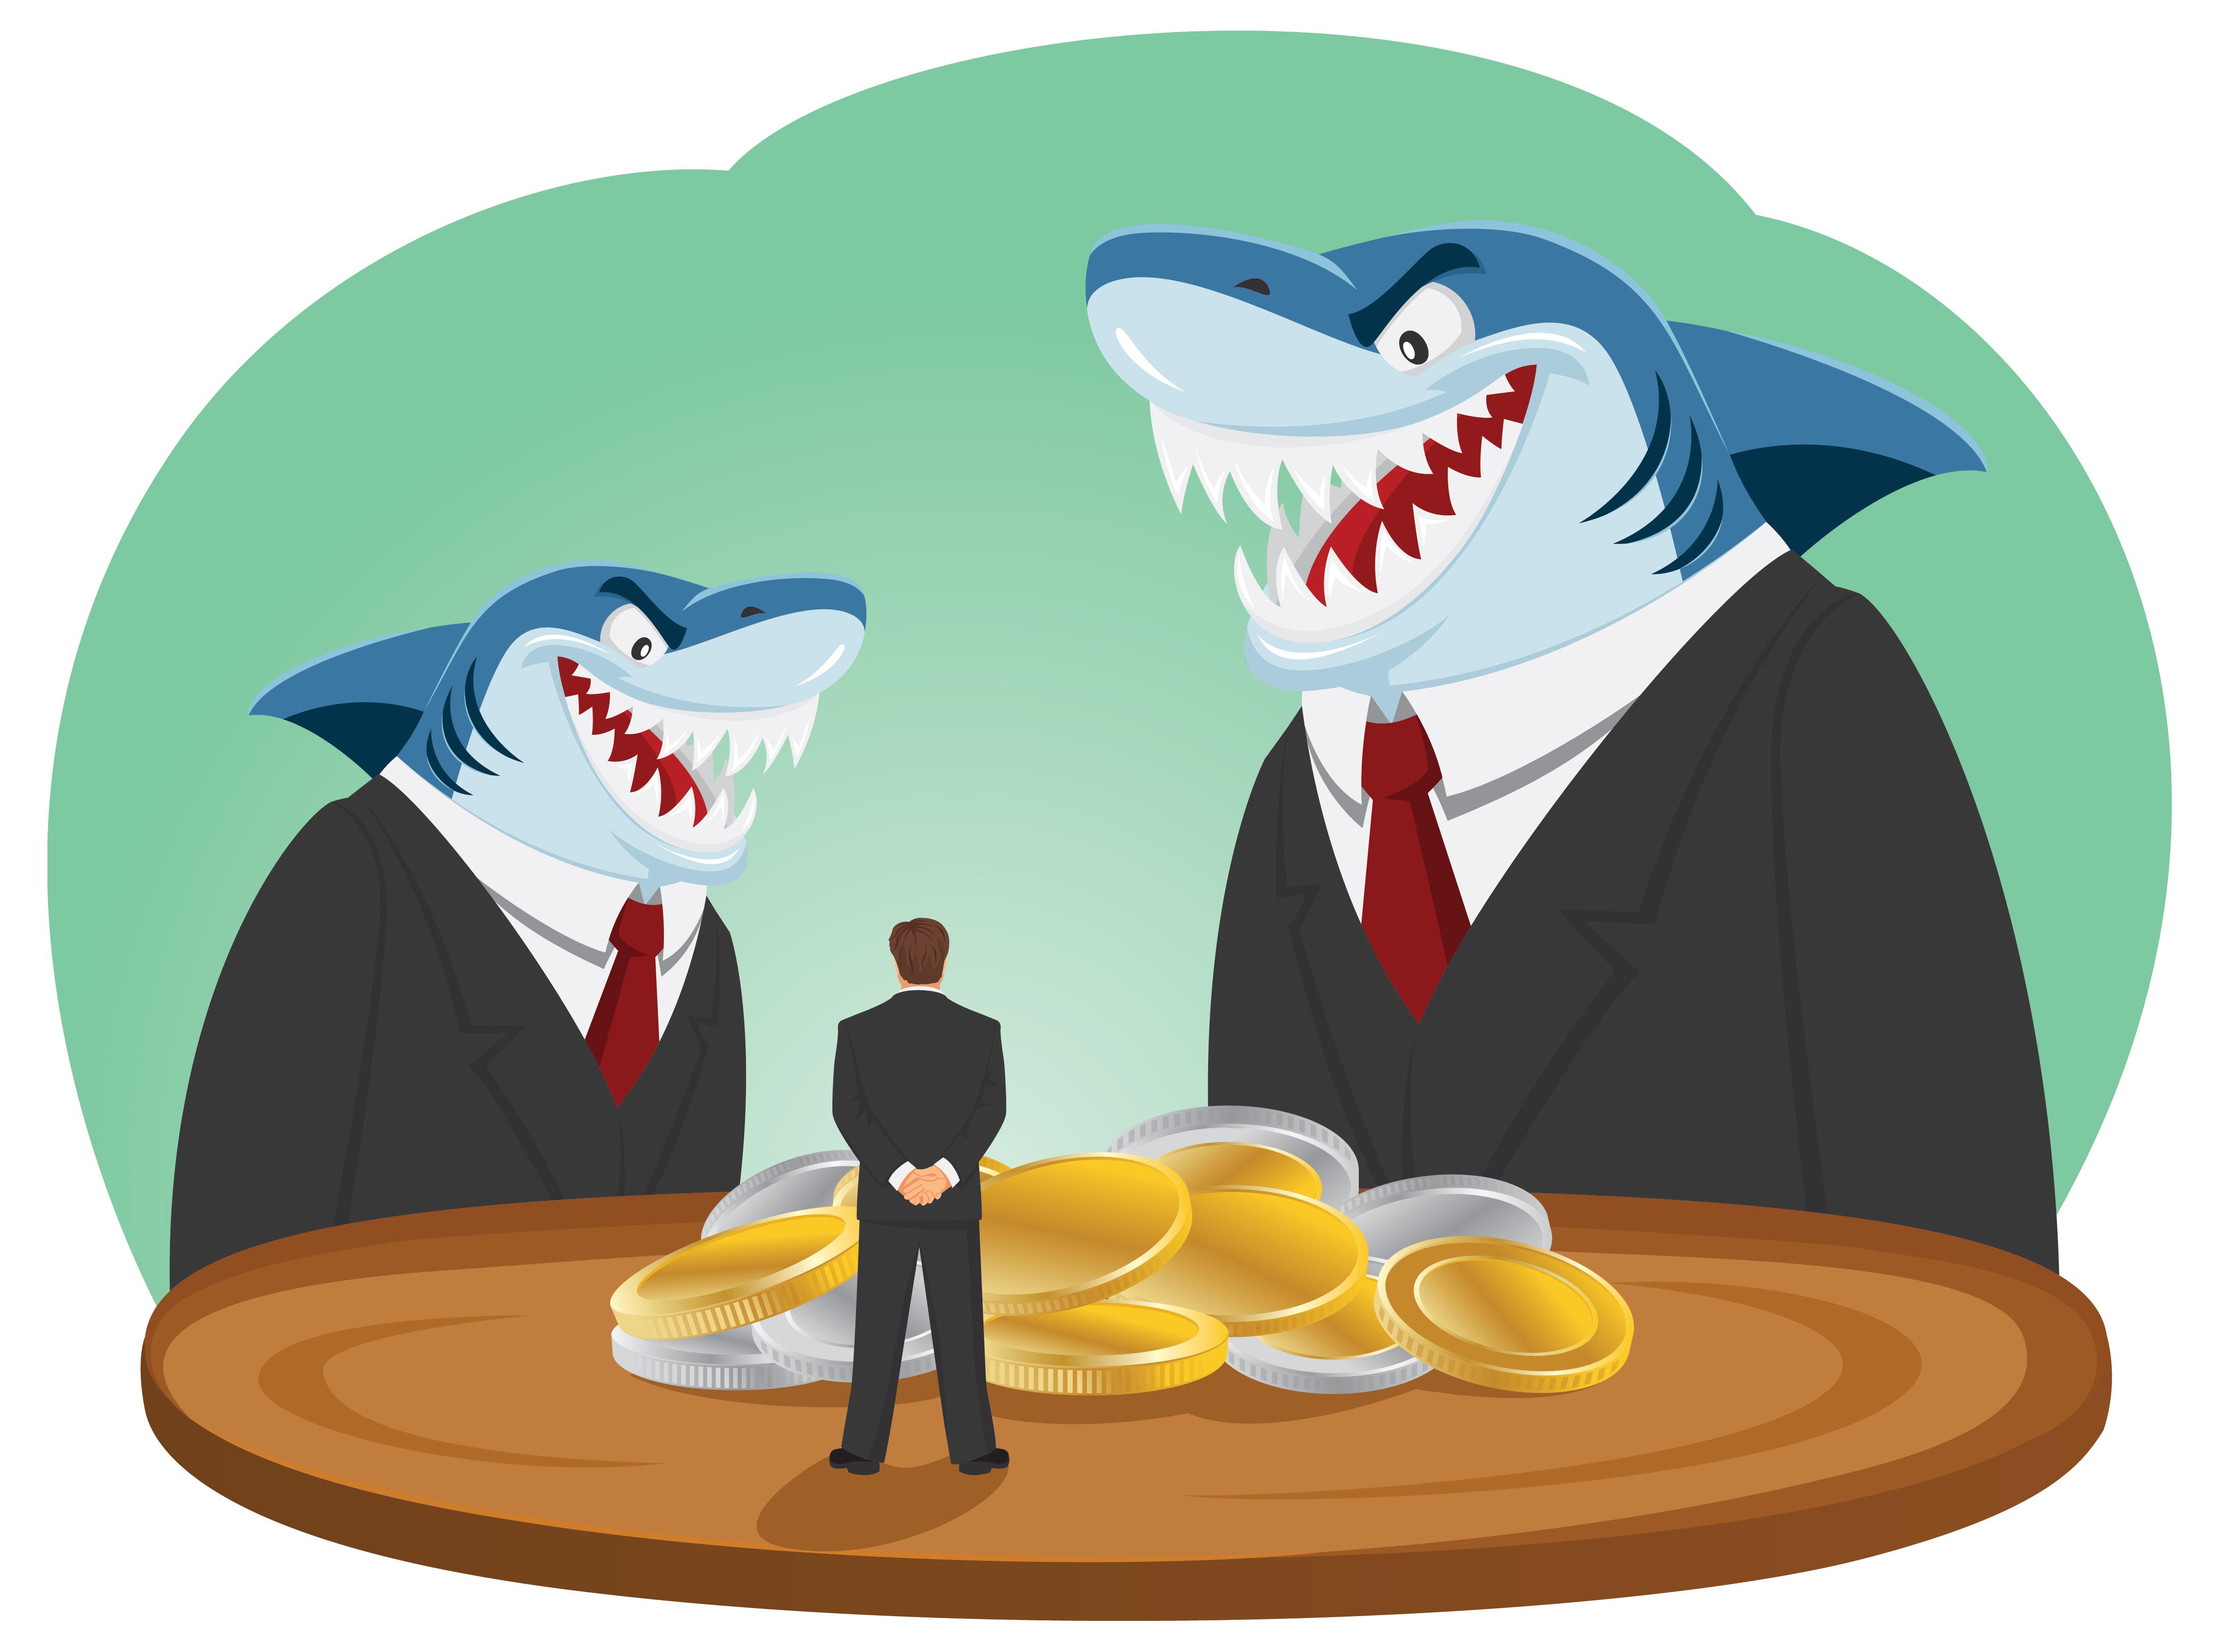 Vector illustration of loan shark predatory lenders